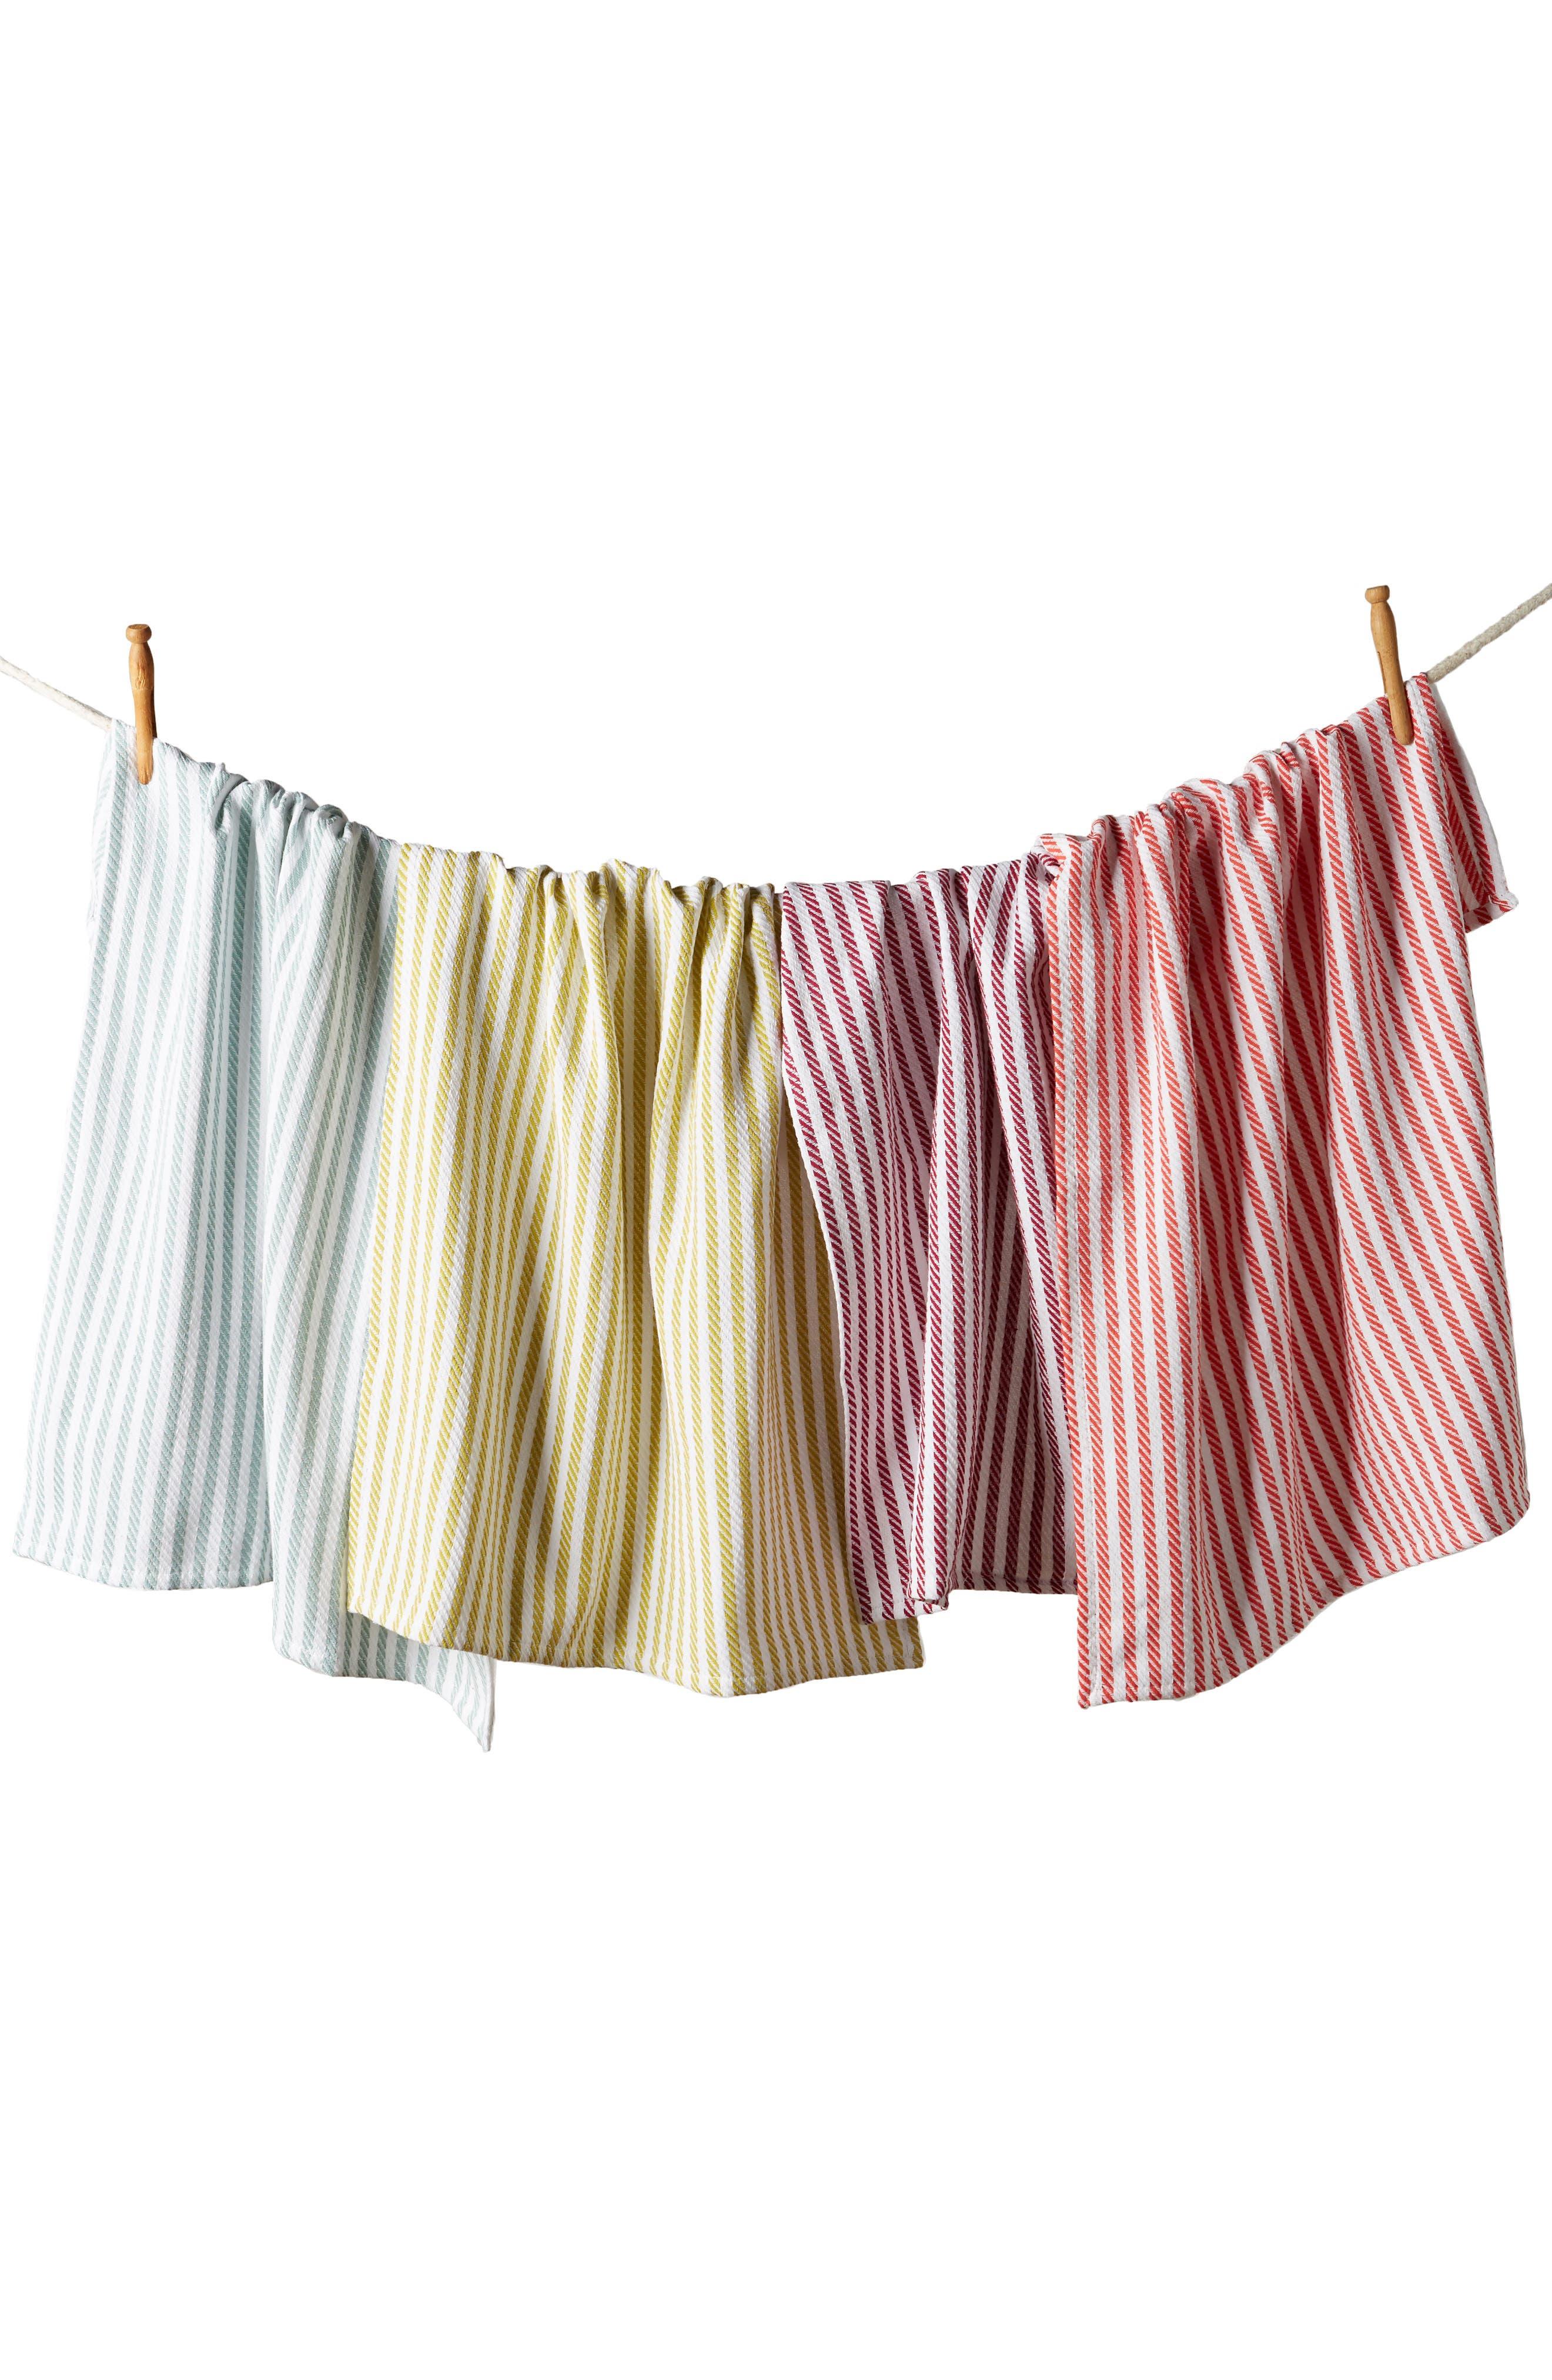 Baker Stripe Set of 4 Dishtowels,                             Alternate thumbnail 3, color,                             Pink Multi